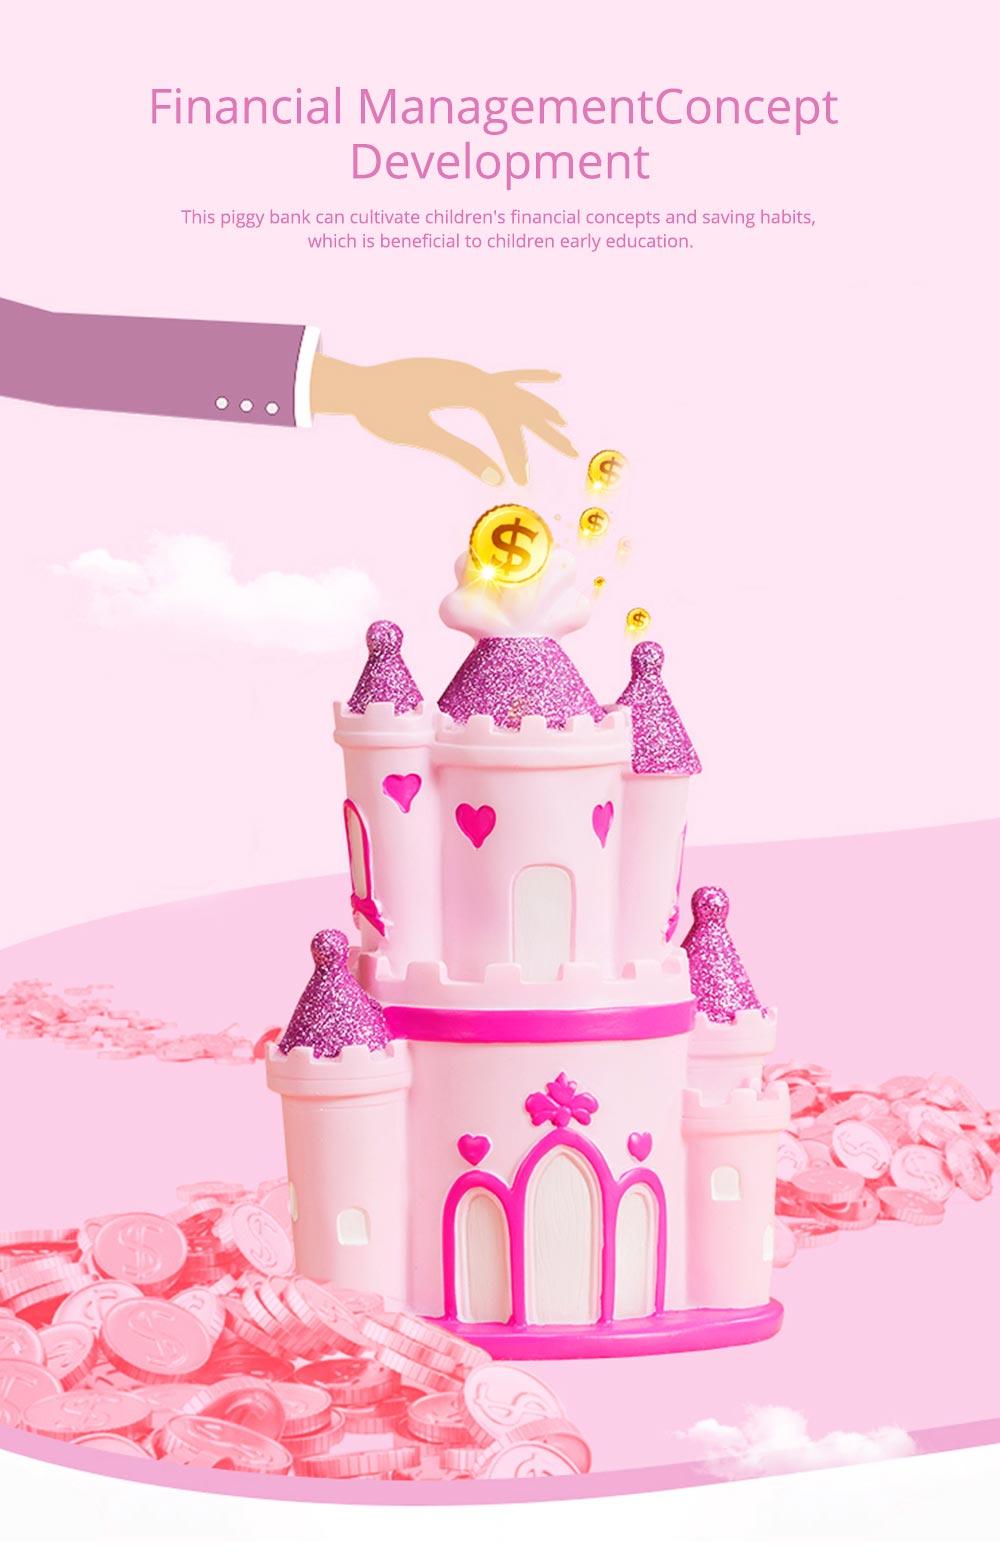 Creative Princess Castle Money Box for Girls, Delicate Elegant Pink Fairytale Castle Birthday Present Piggy Bank 3